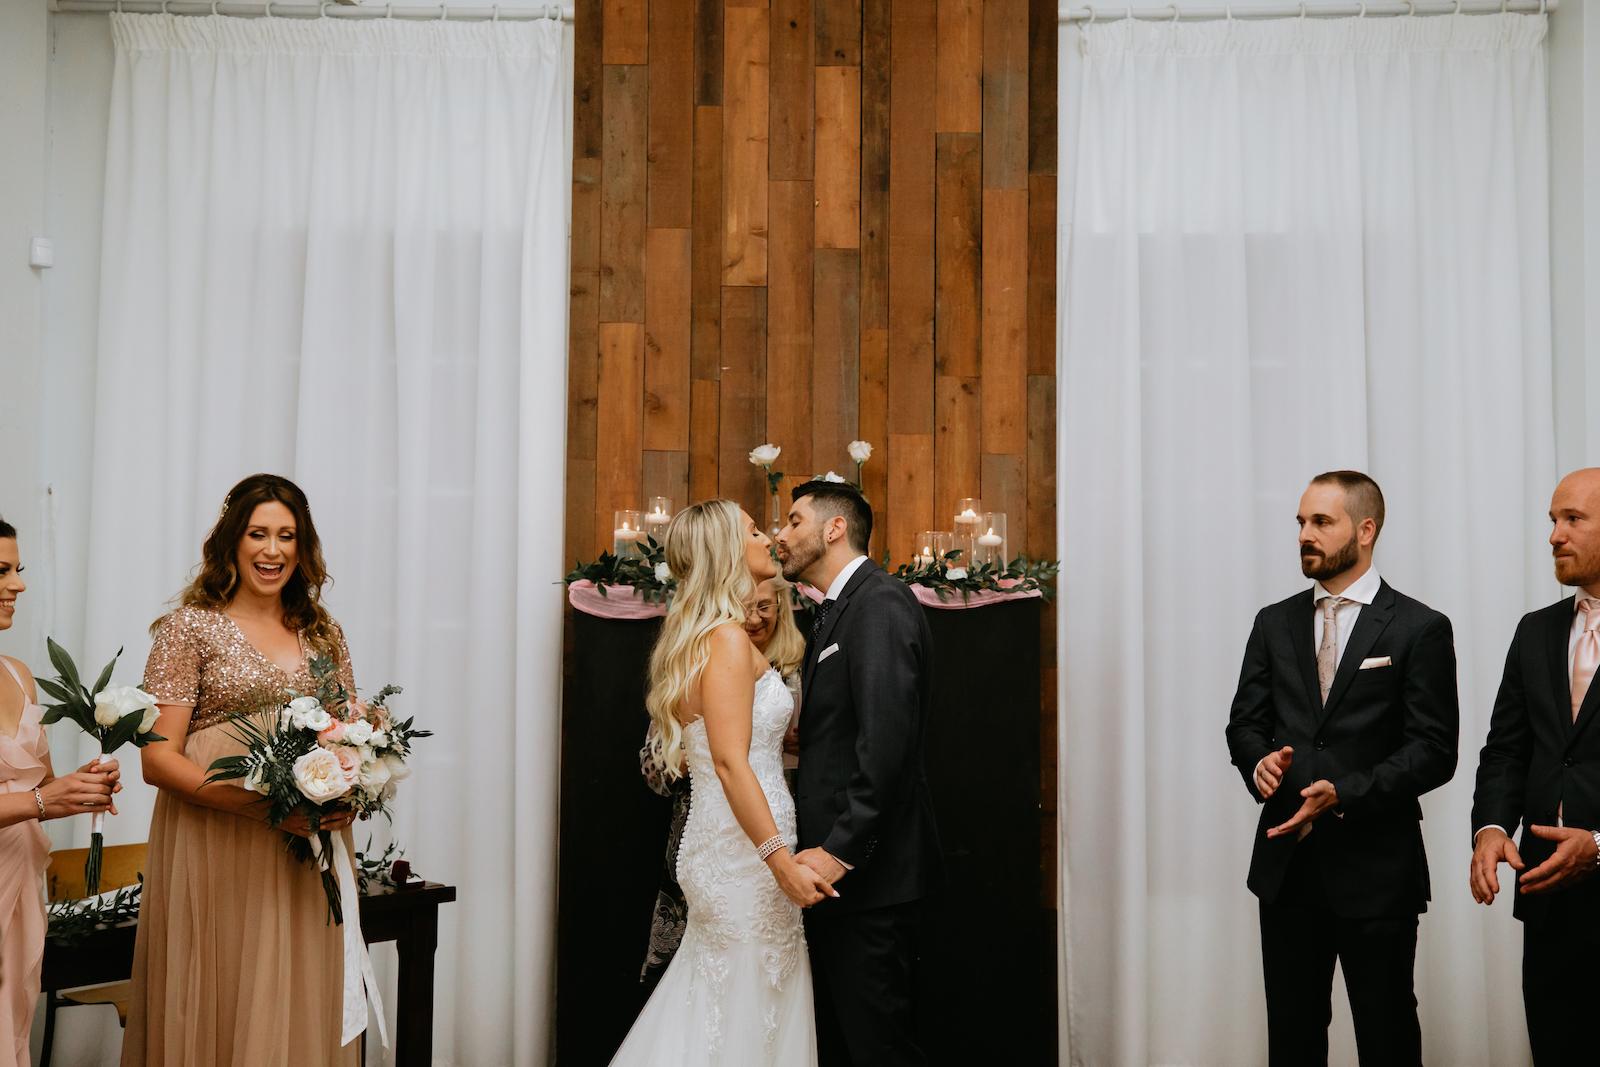 Industrial-Vibe-Wedding-Sambajoy-Photo-Art-24.jpg